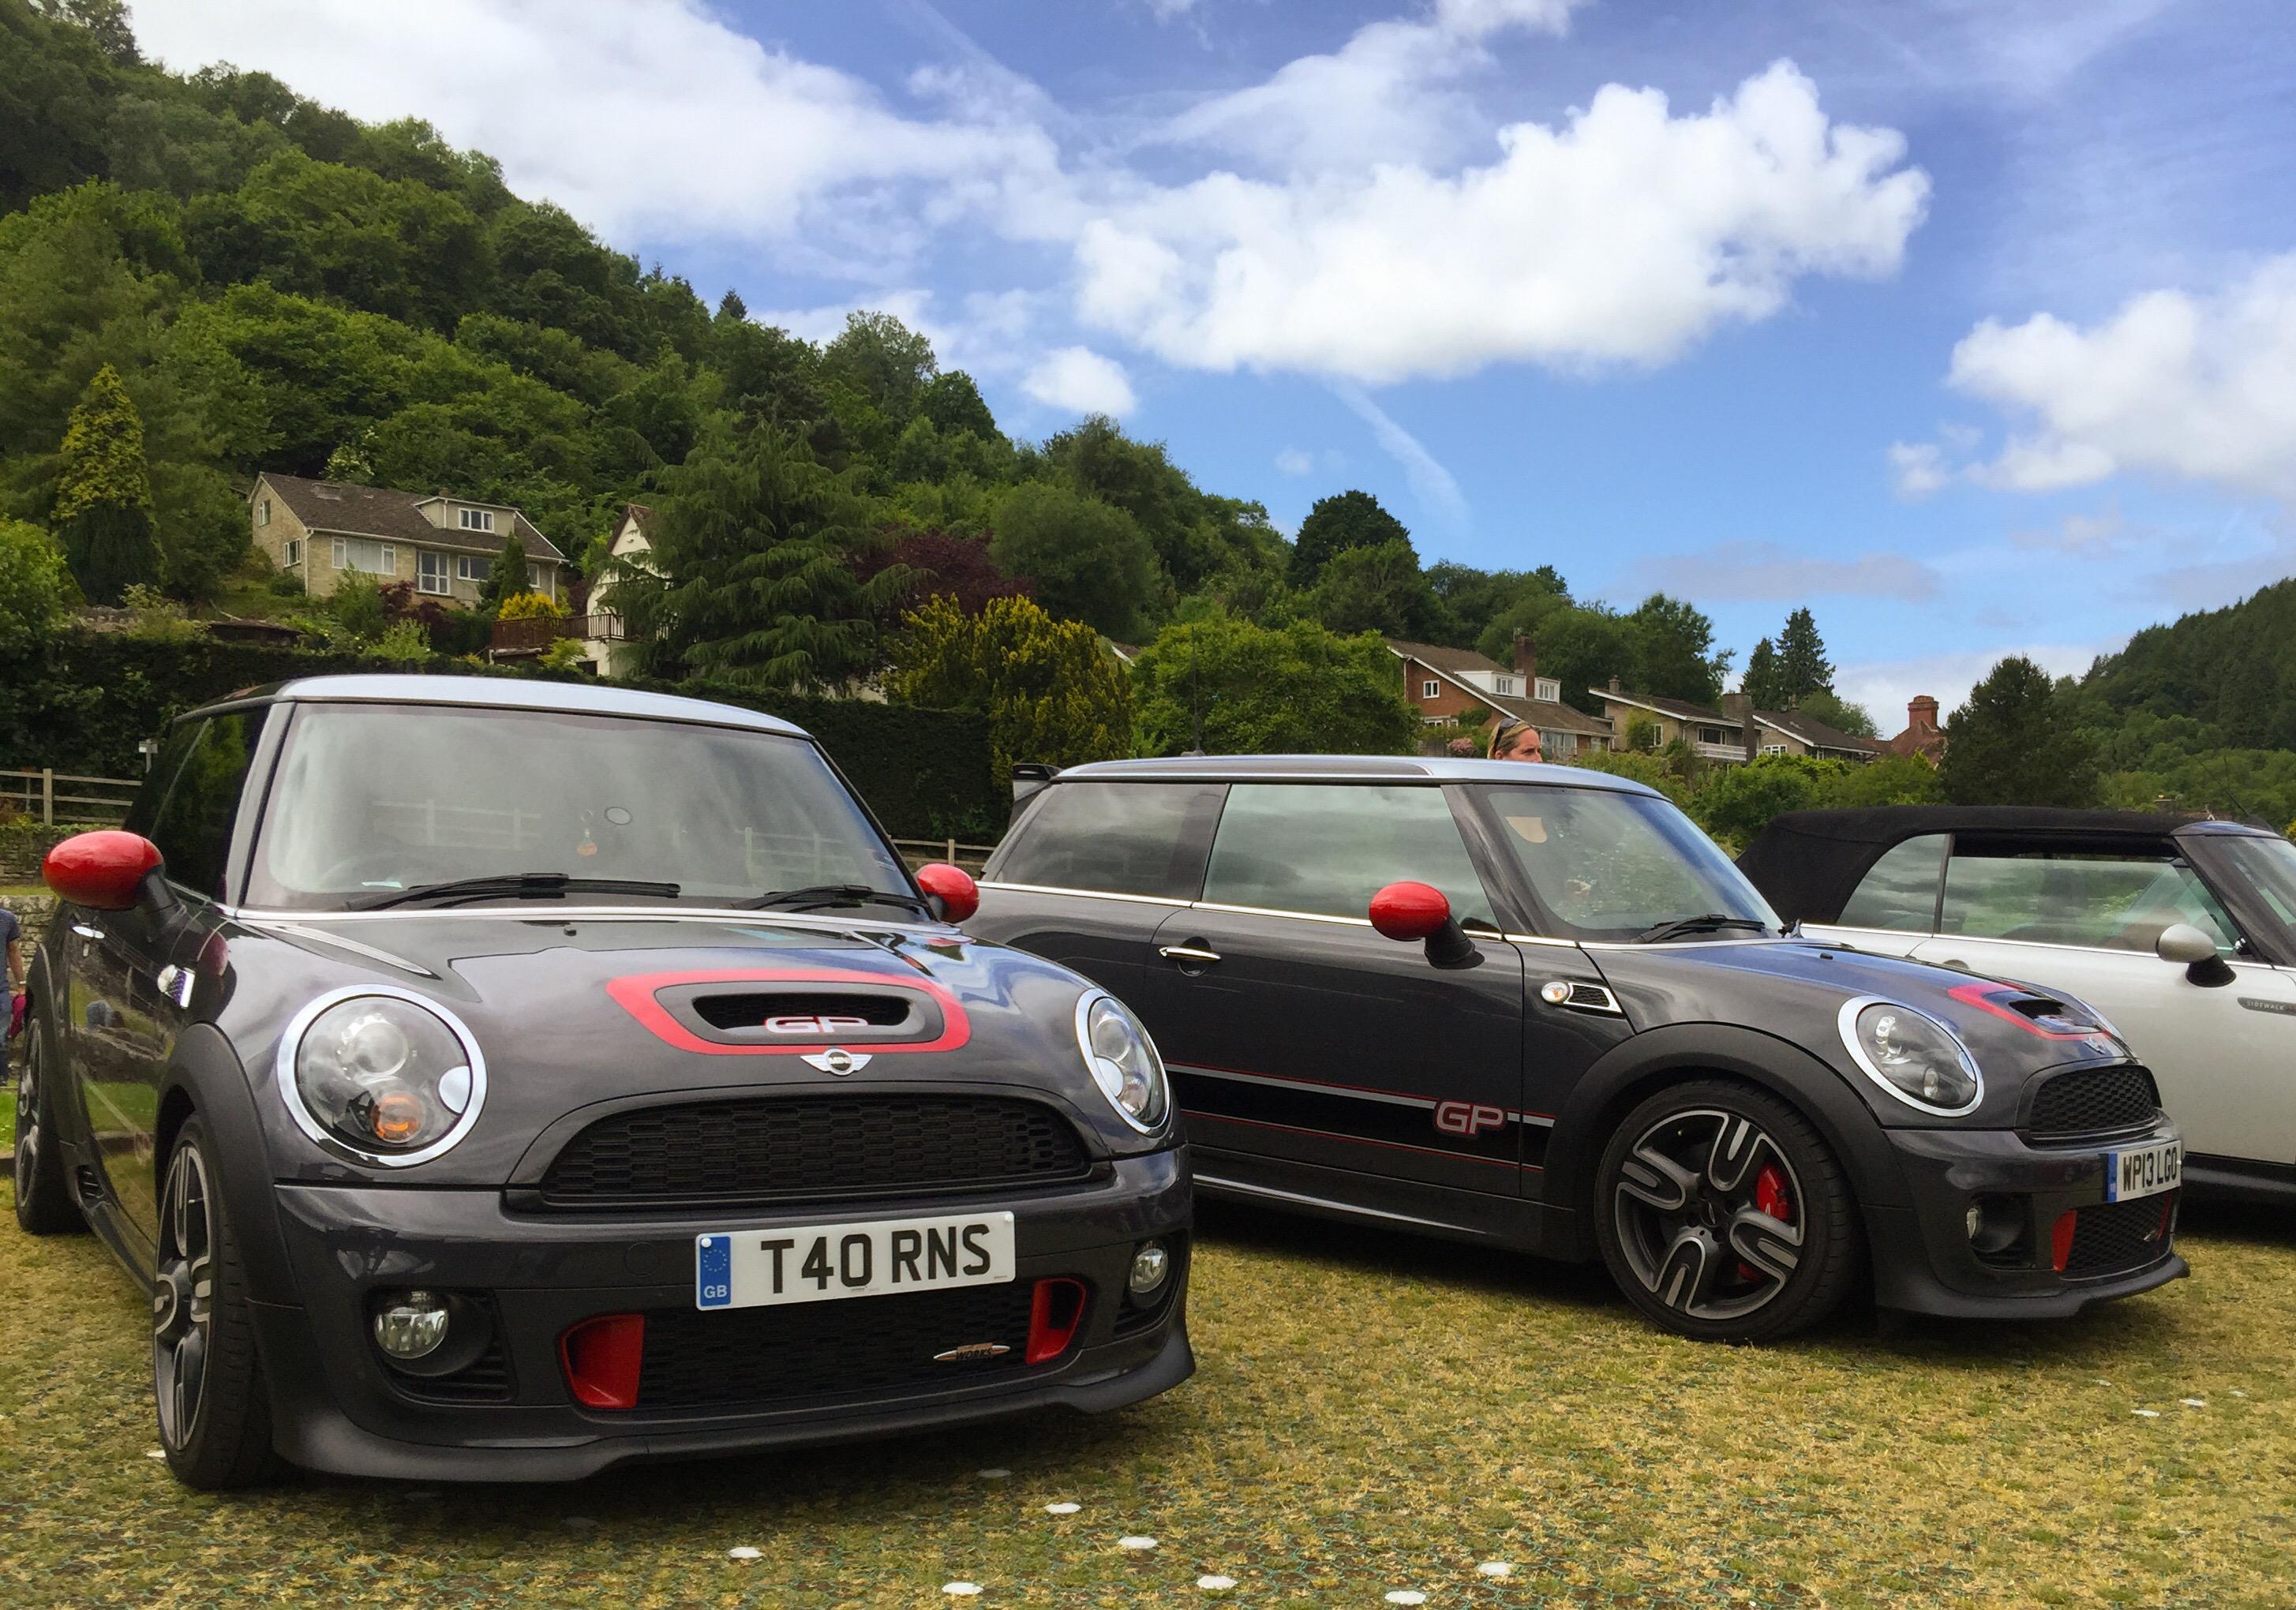 Car Events Miniacs Only Tintern Abbey Meet AutoBeast - Car events today near me